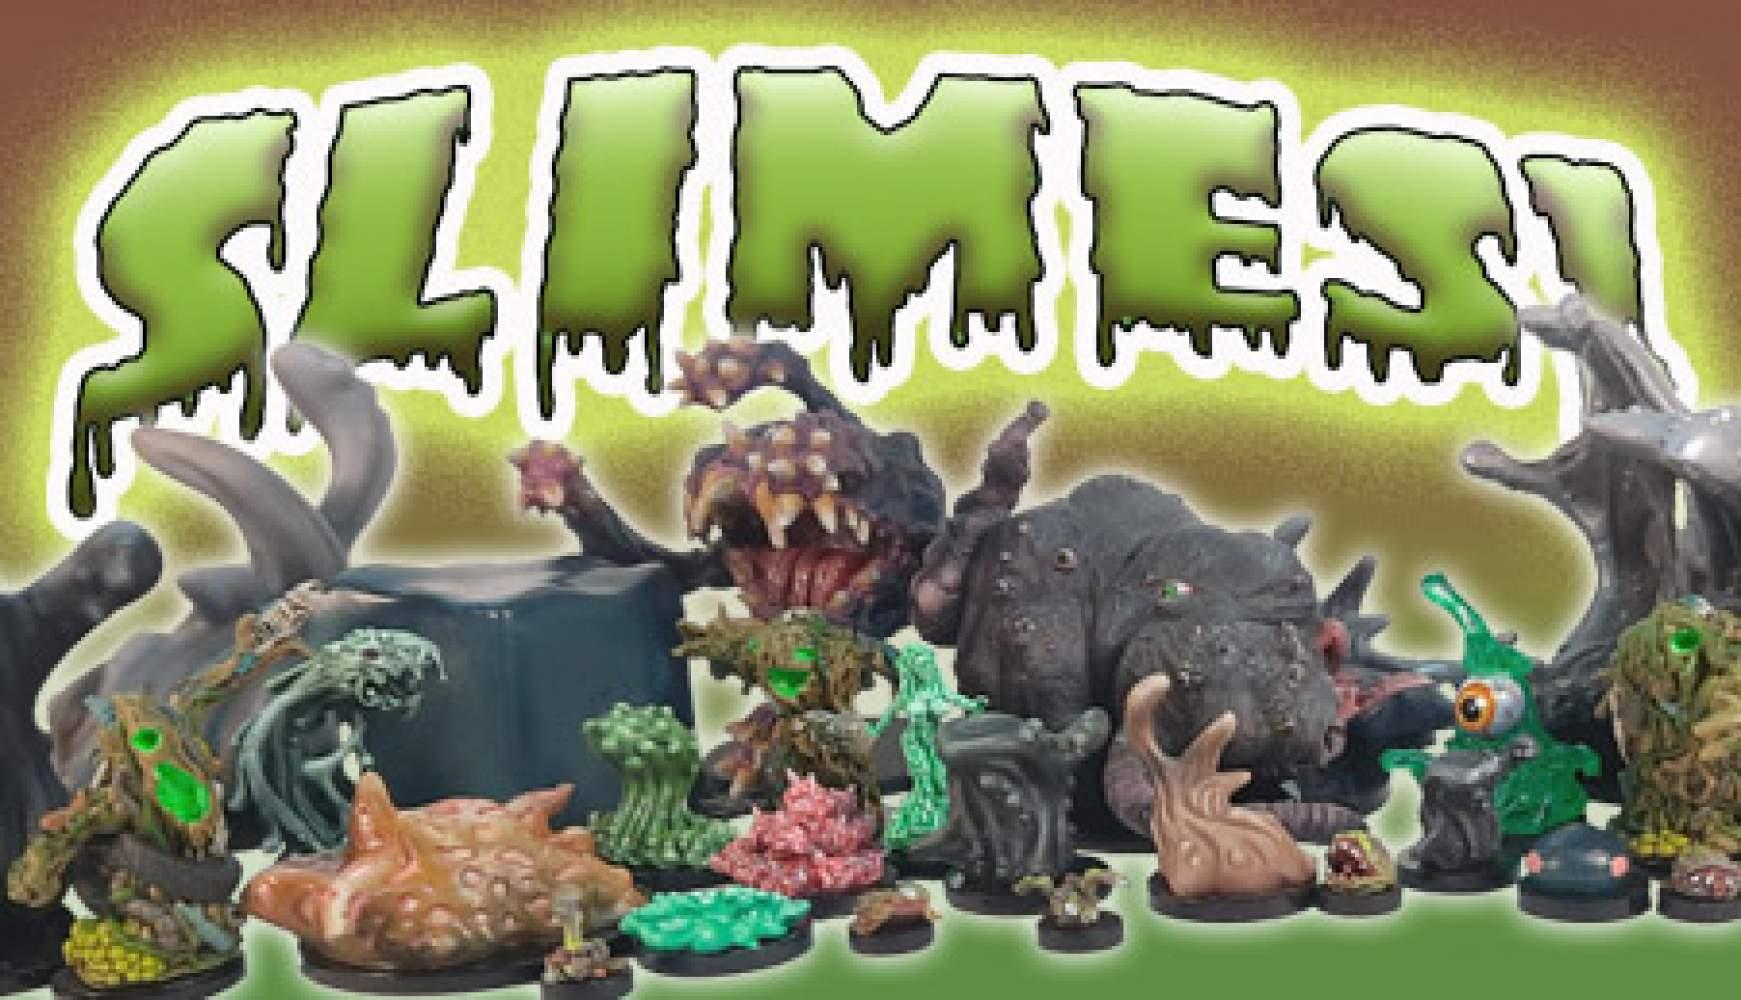 Slimes!